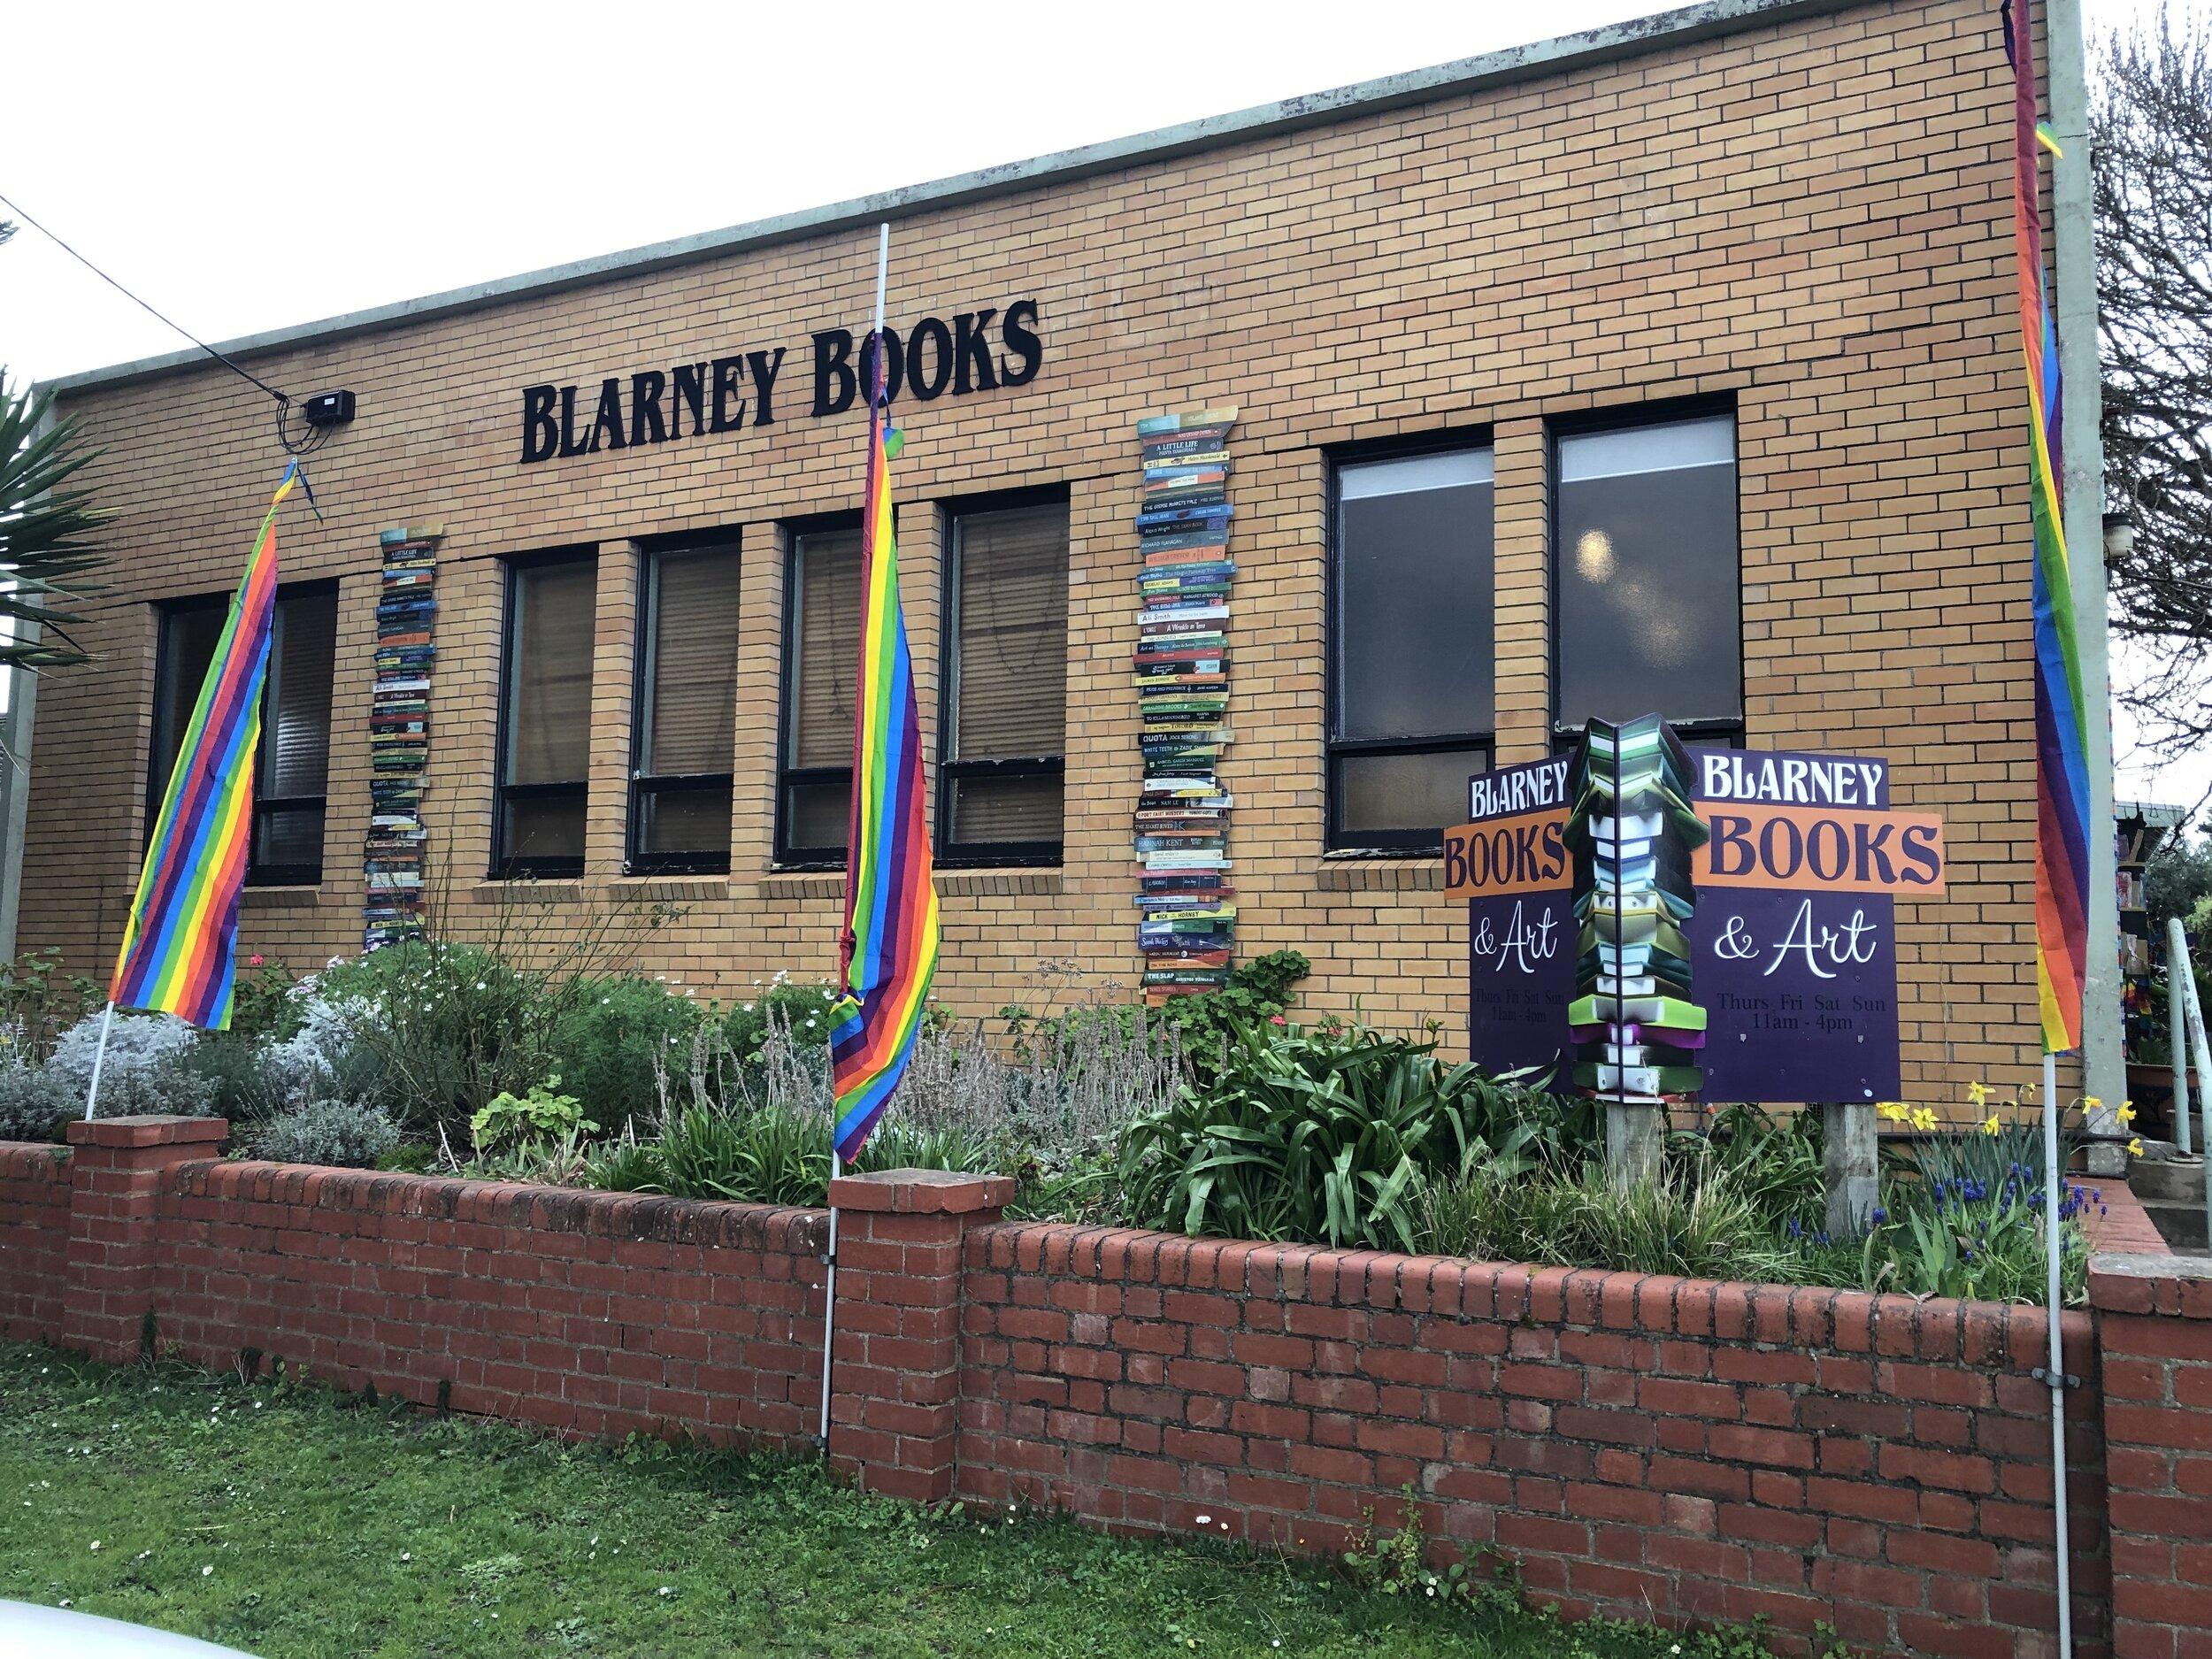 Blarney Books and Art 2019.jpg